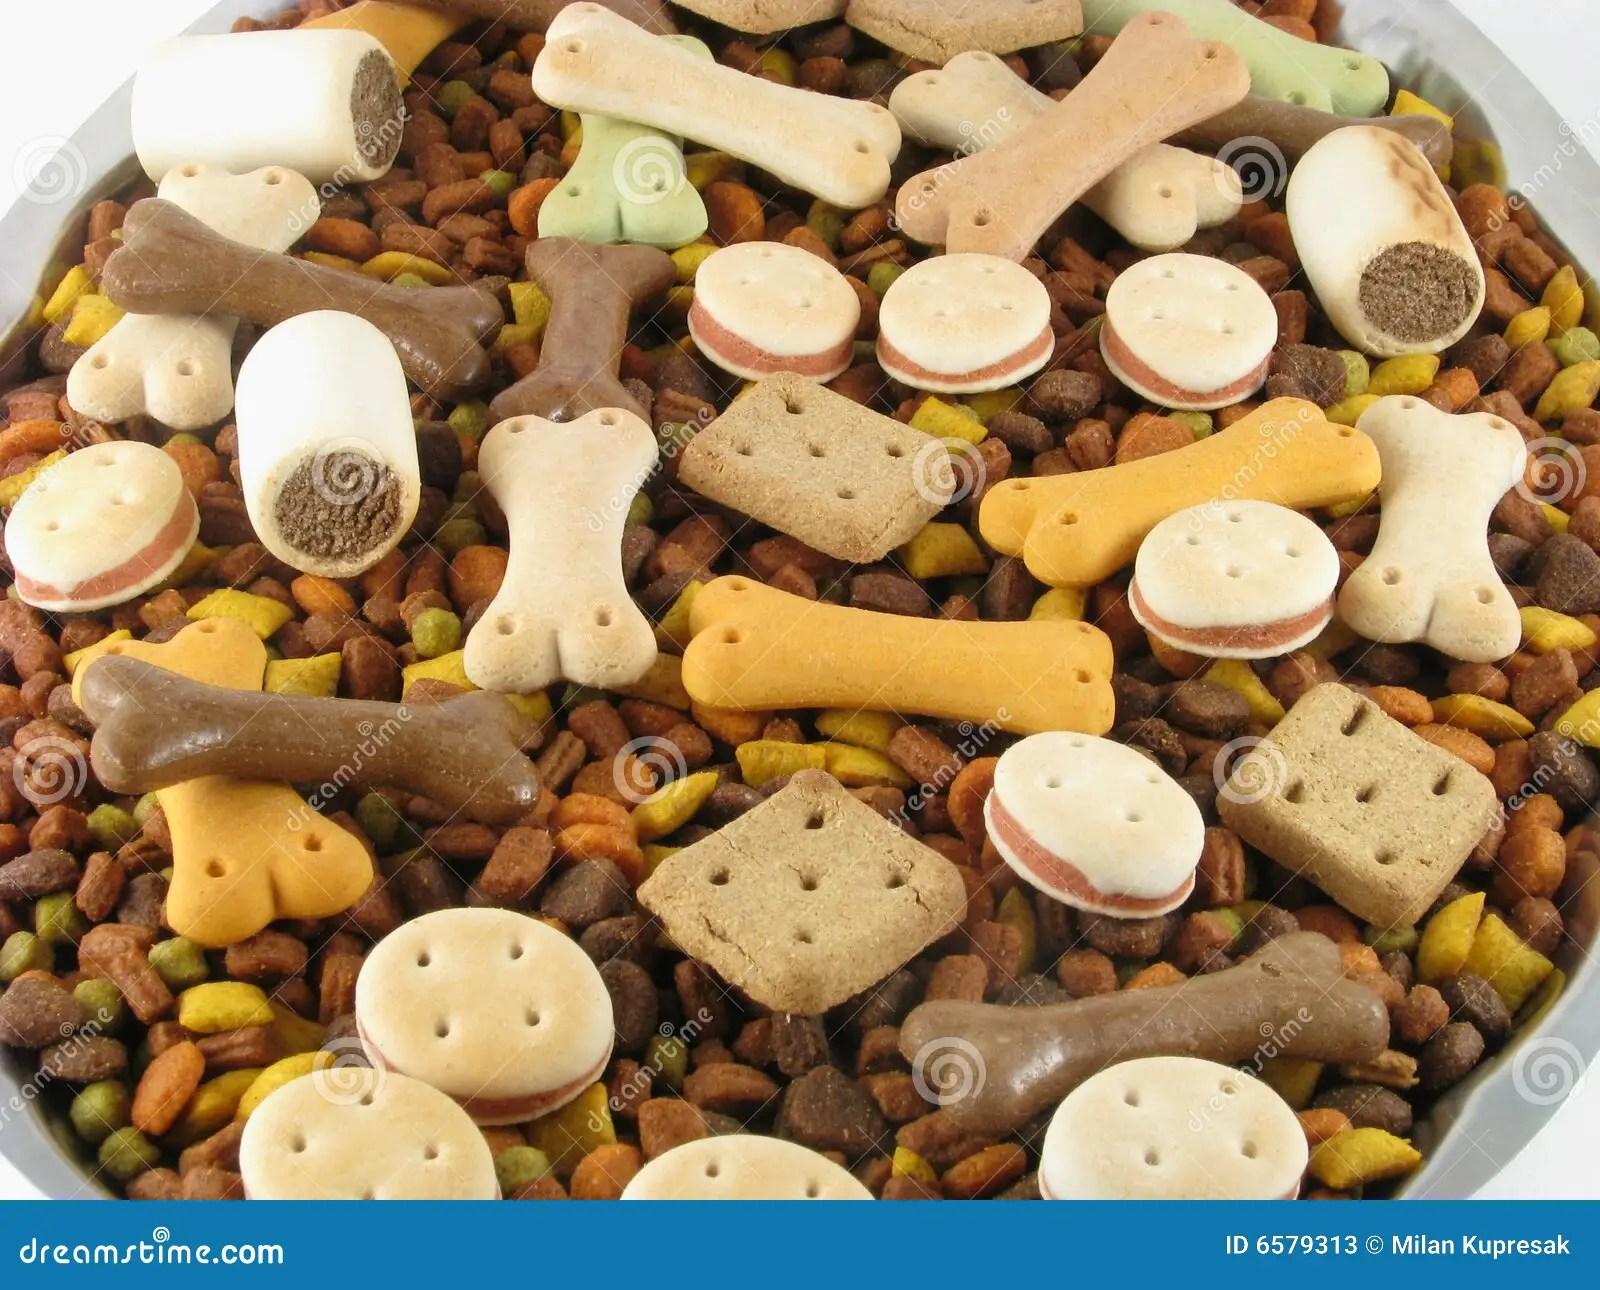 Animal Food Stock Image Image Of Animal Preserve Meal